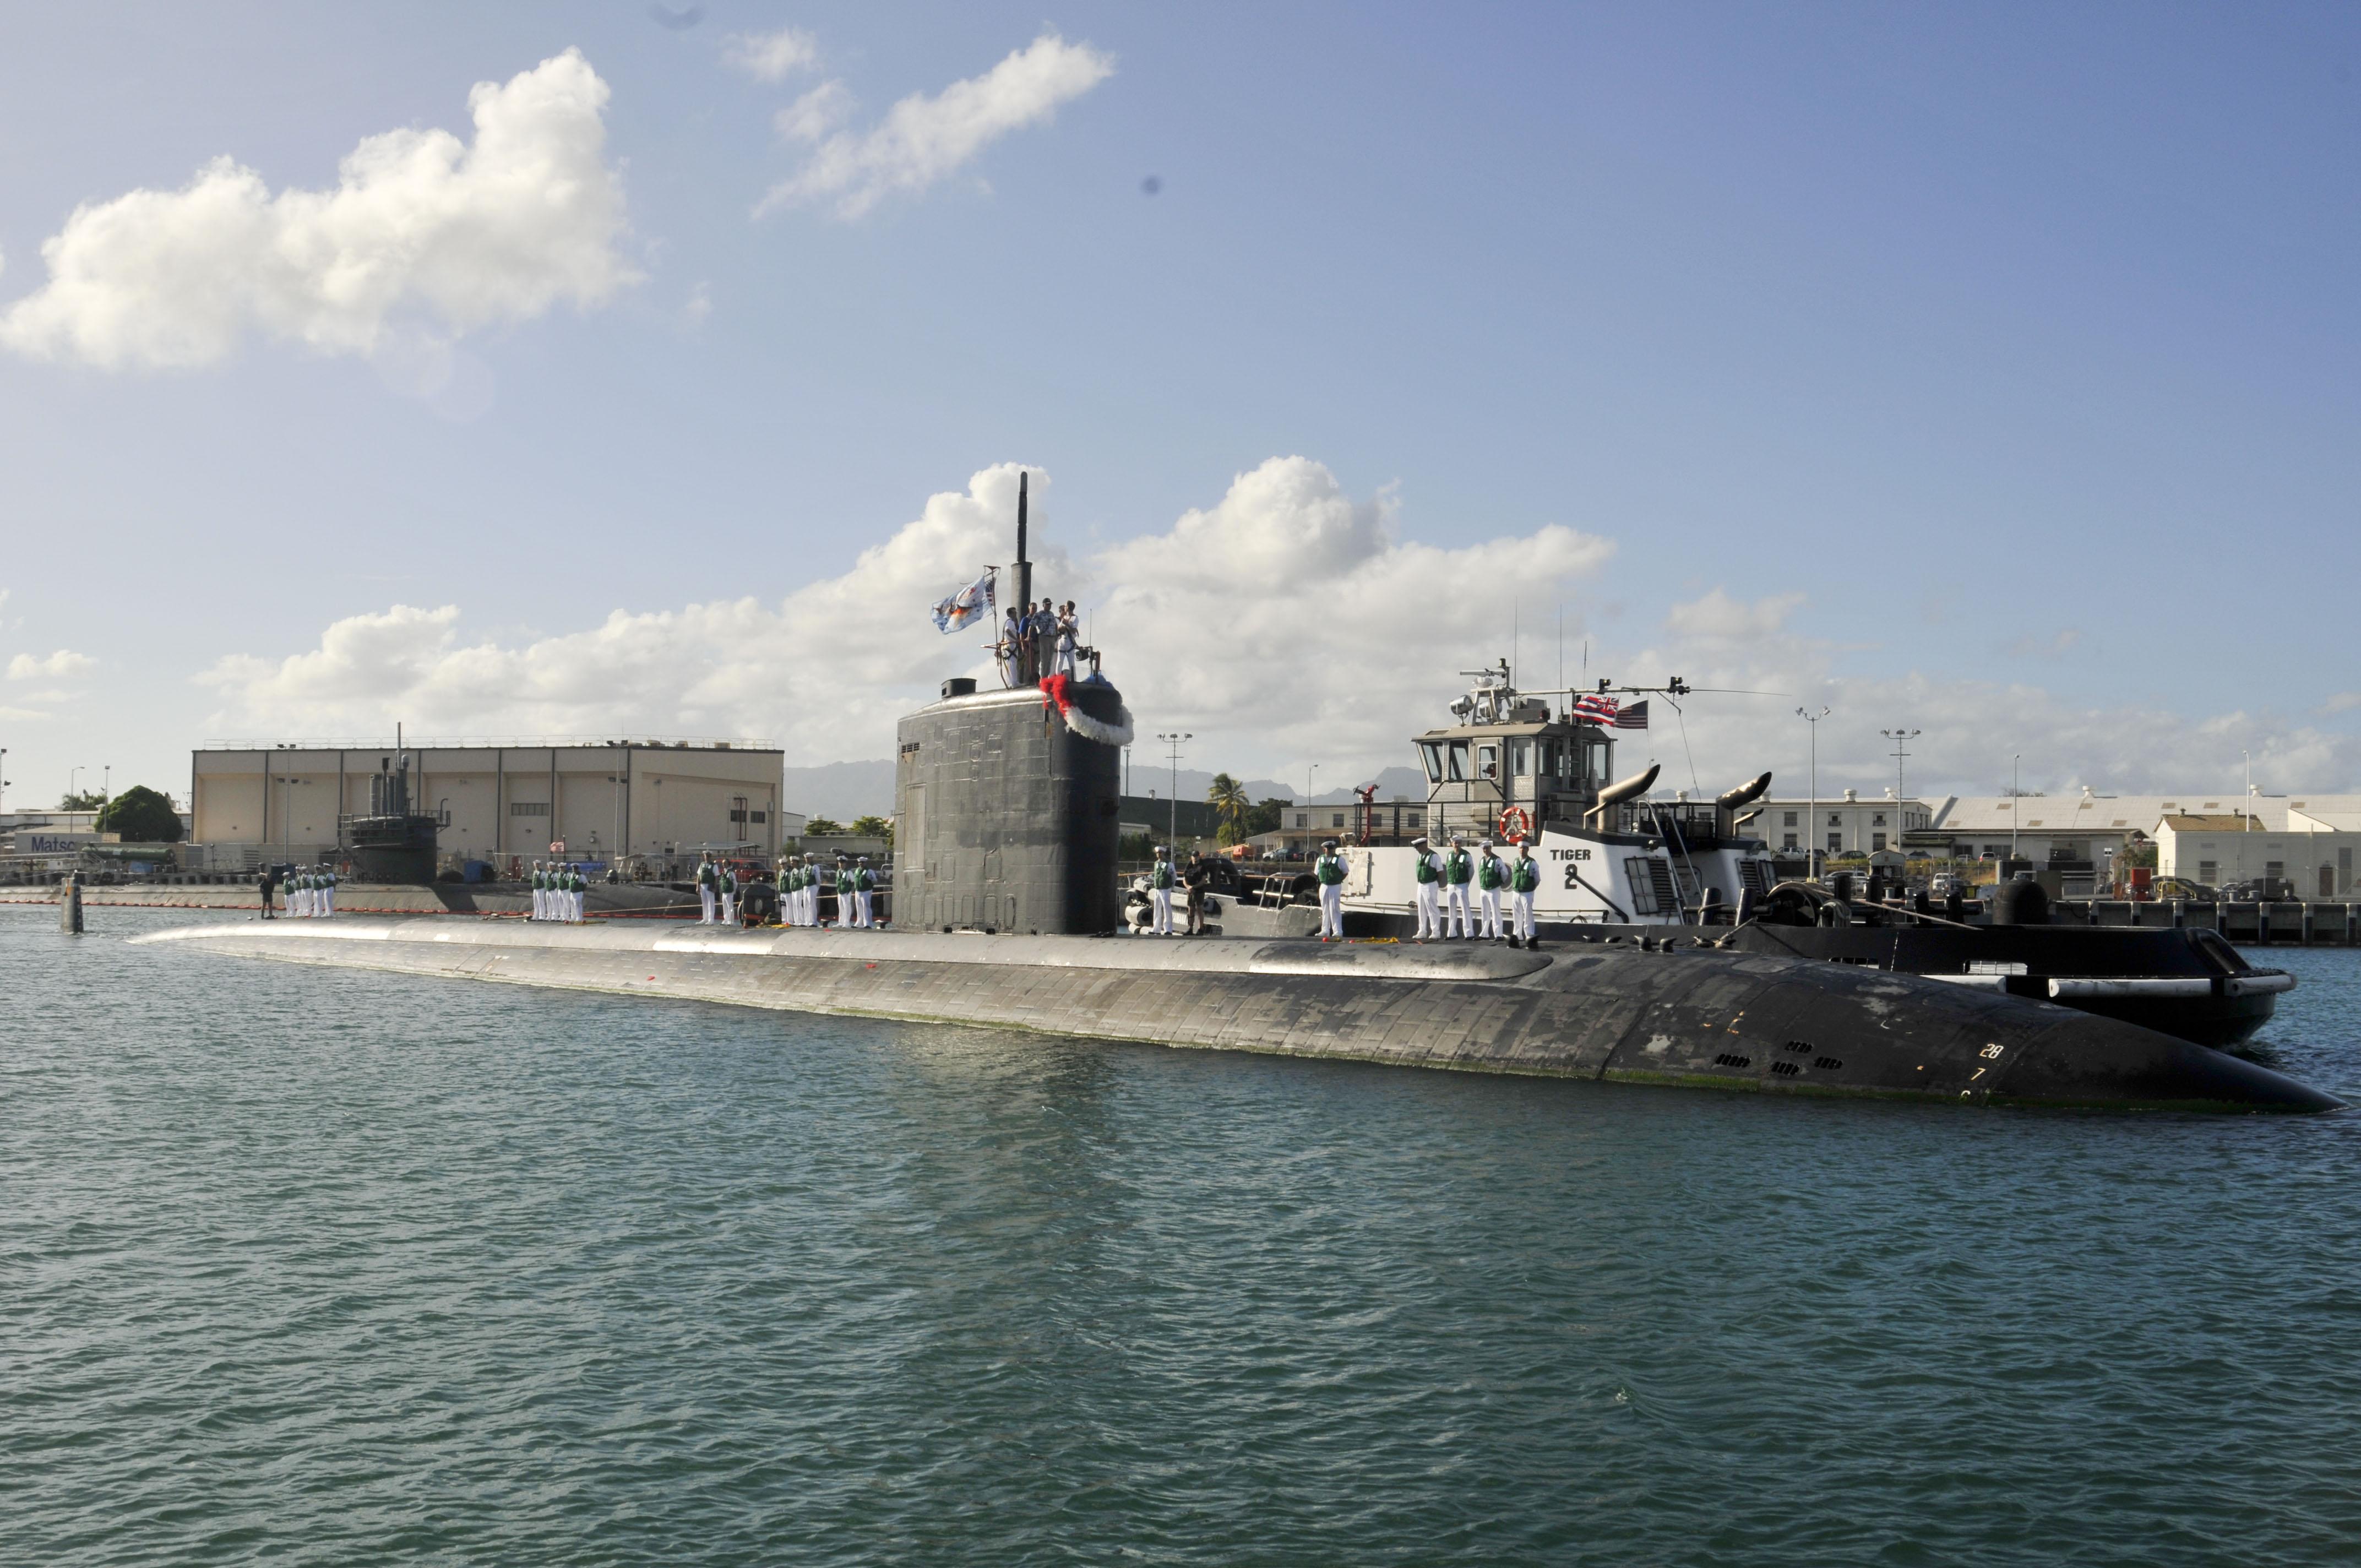 USS COLUMBIA SSN-771 Einlaufen Pearl Harbor am 21.11.2014 Bild: U.S. Navy